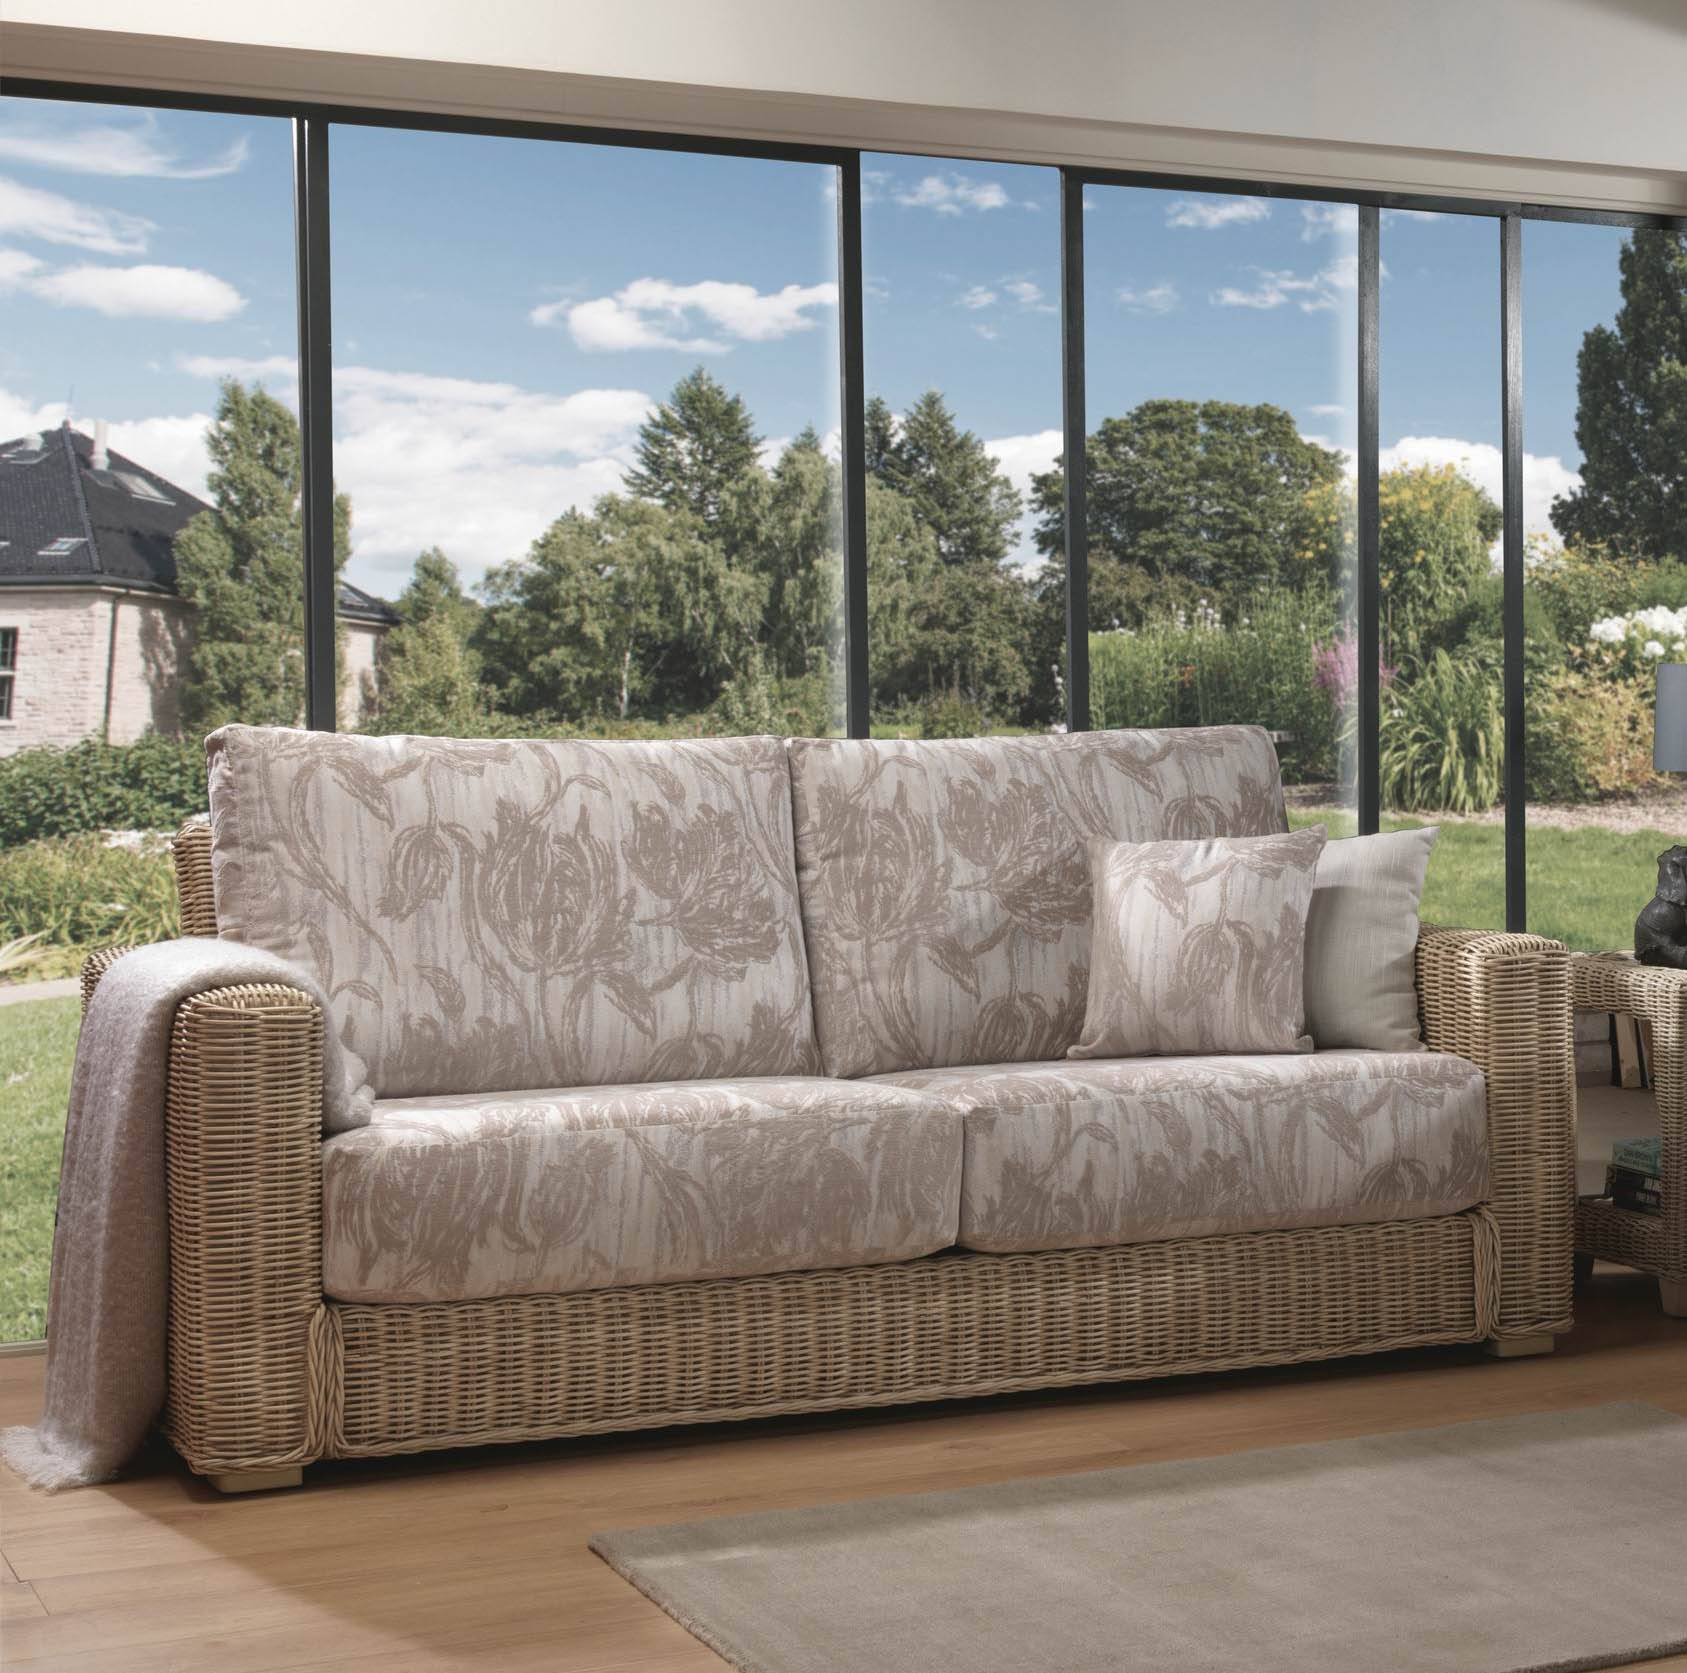 Desser Burford 3 Seater Sofa Sold at Highgate Furniture Southend On Sea